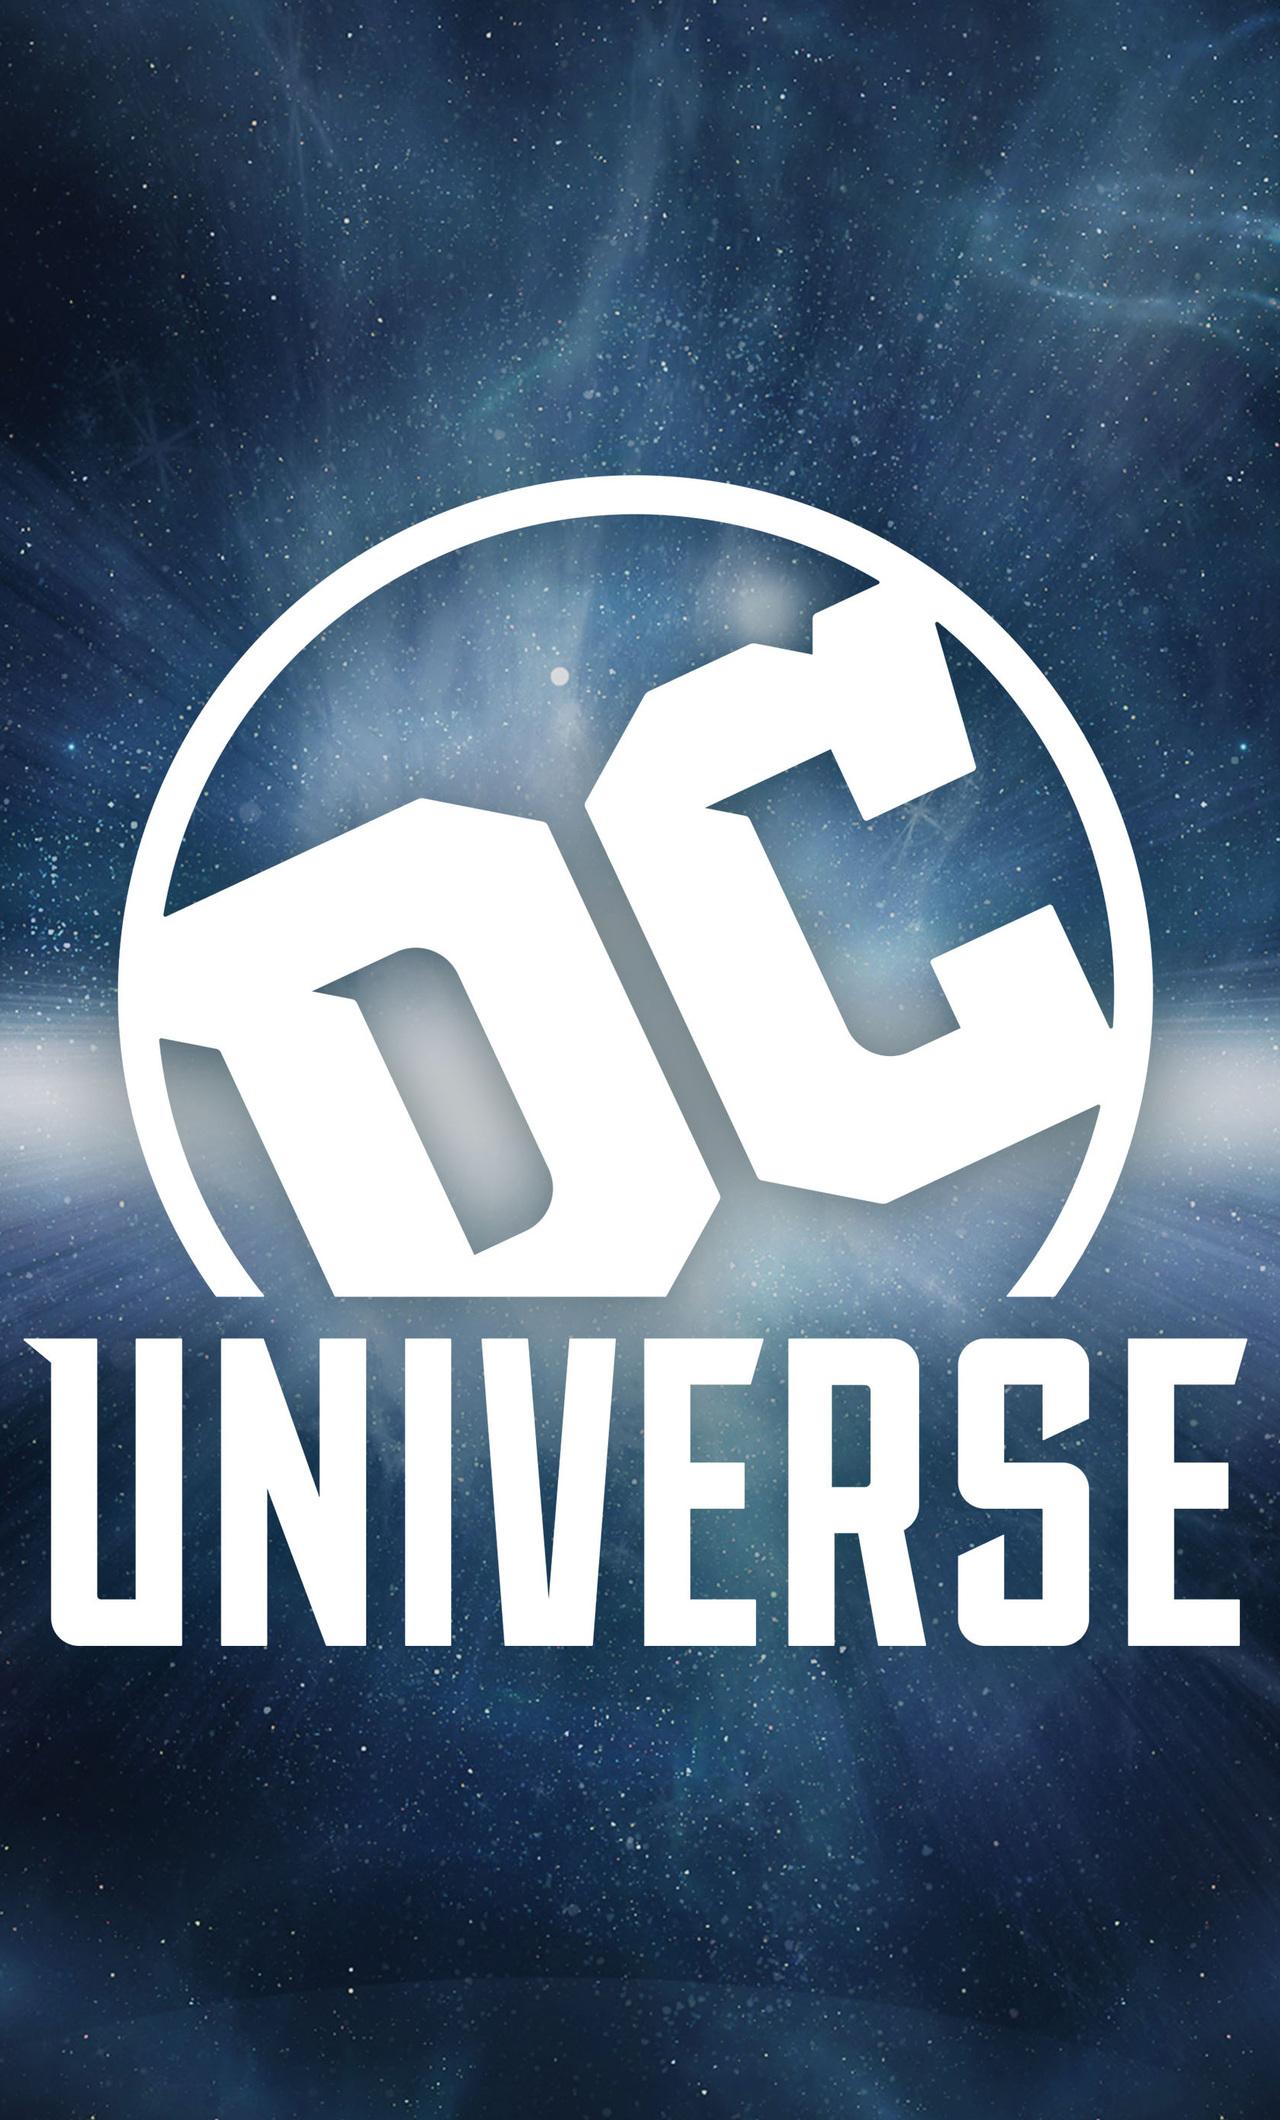 dc-universe-new-logo-7b.jpg